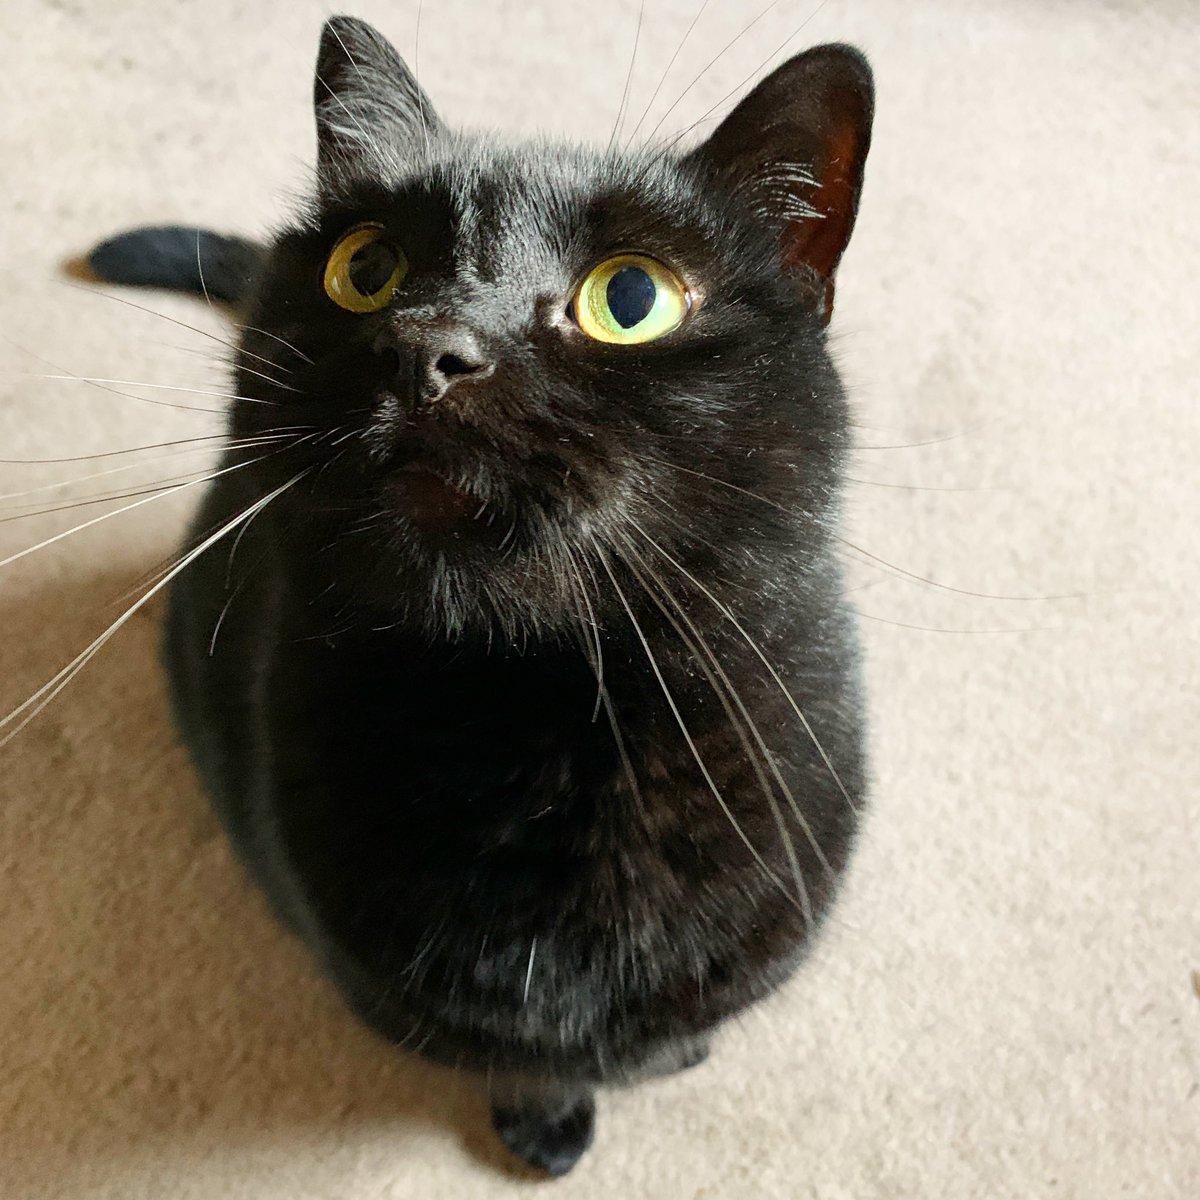 Morning cat and soundtrack.  -  #corkcity #kmru #blackcat #pluto https://t.co/WKbWM77Lyf